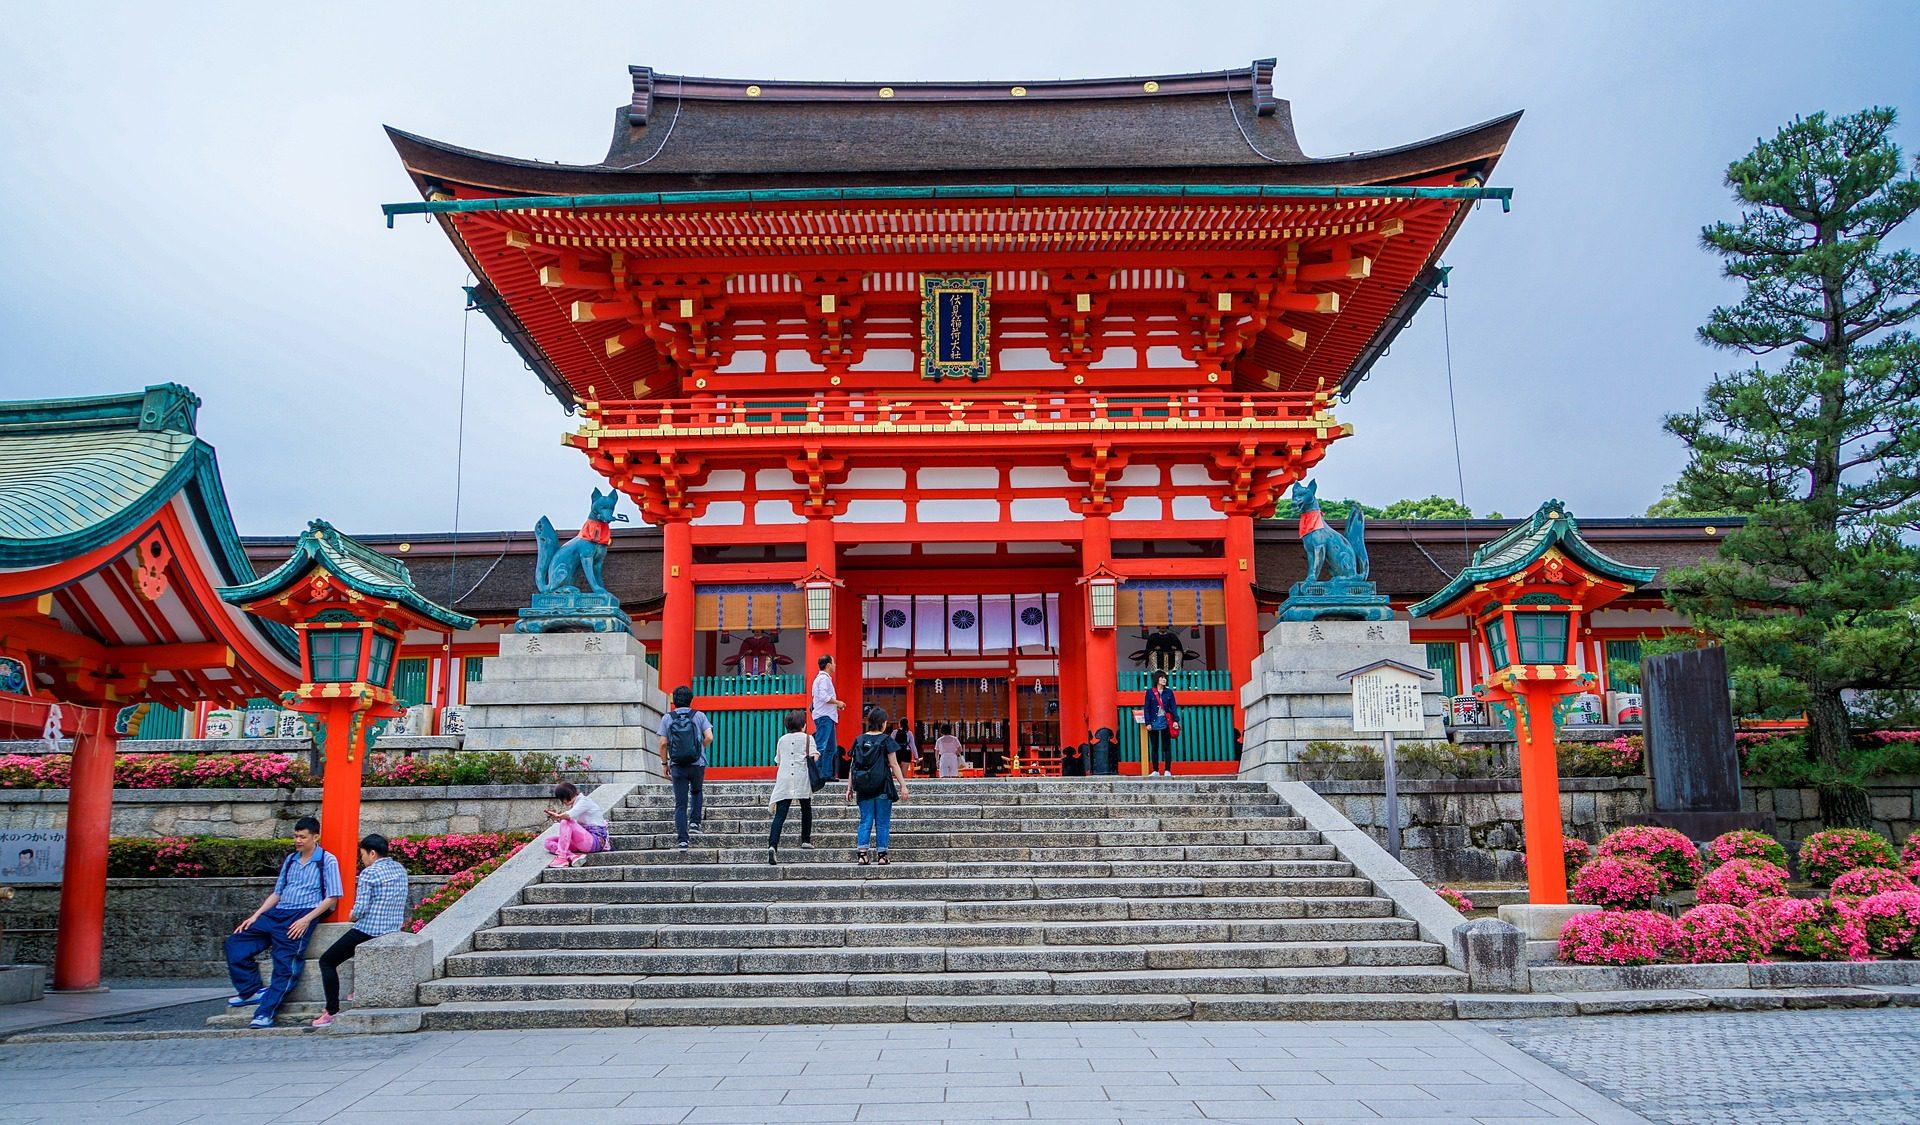 Fushimi inari-taisha Shrine, Kyoto, Japan